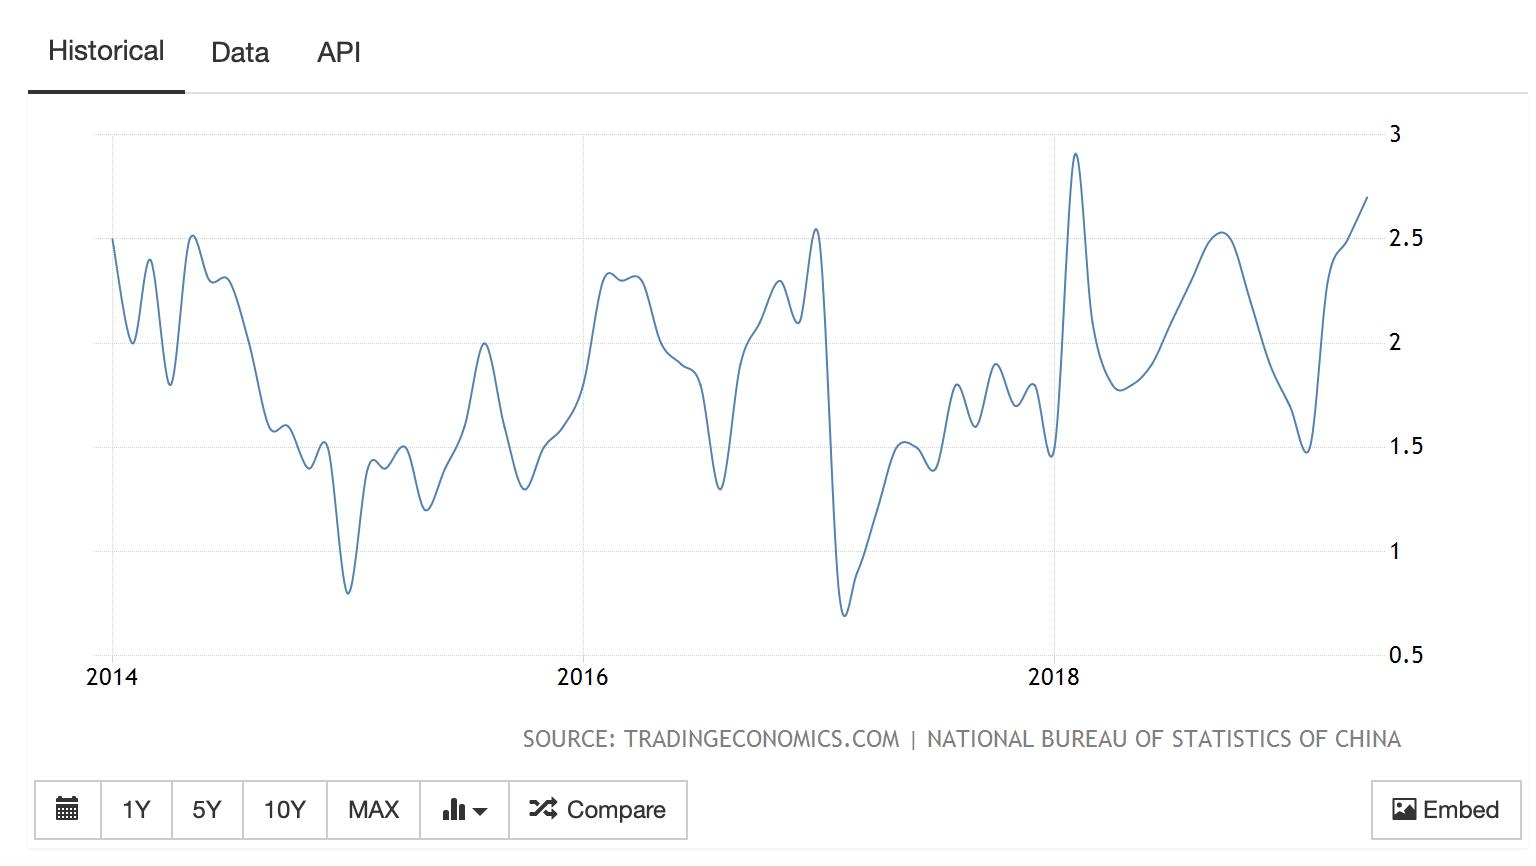 Source: Trading Economics, 2019b